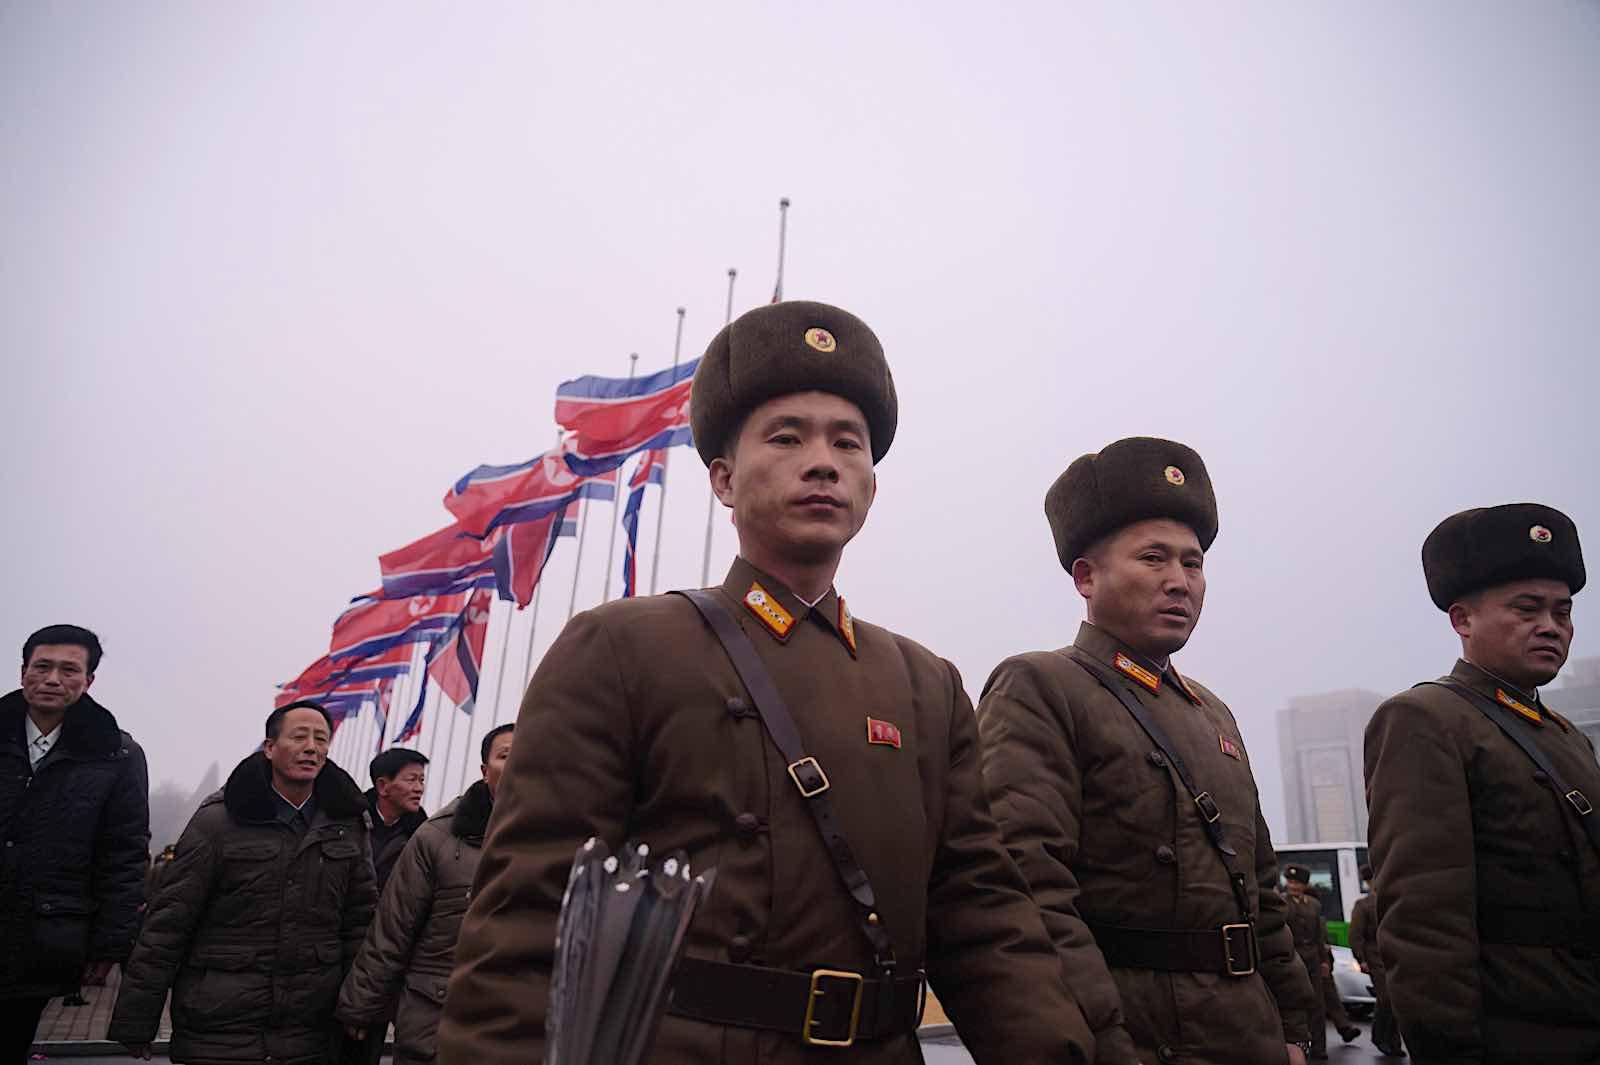 Photo: Kim Won Jin/AFP/Getty Images